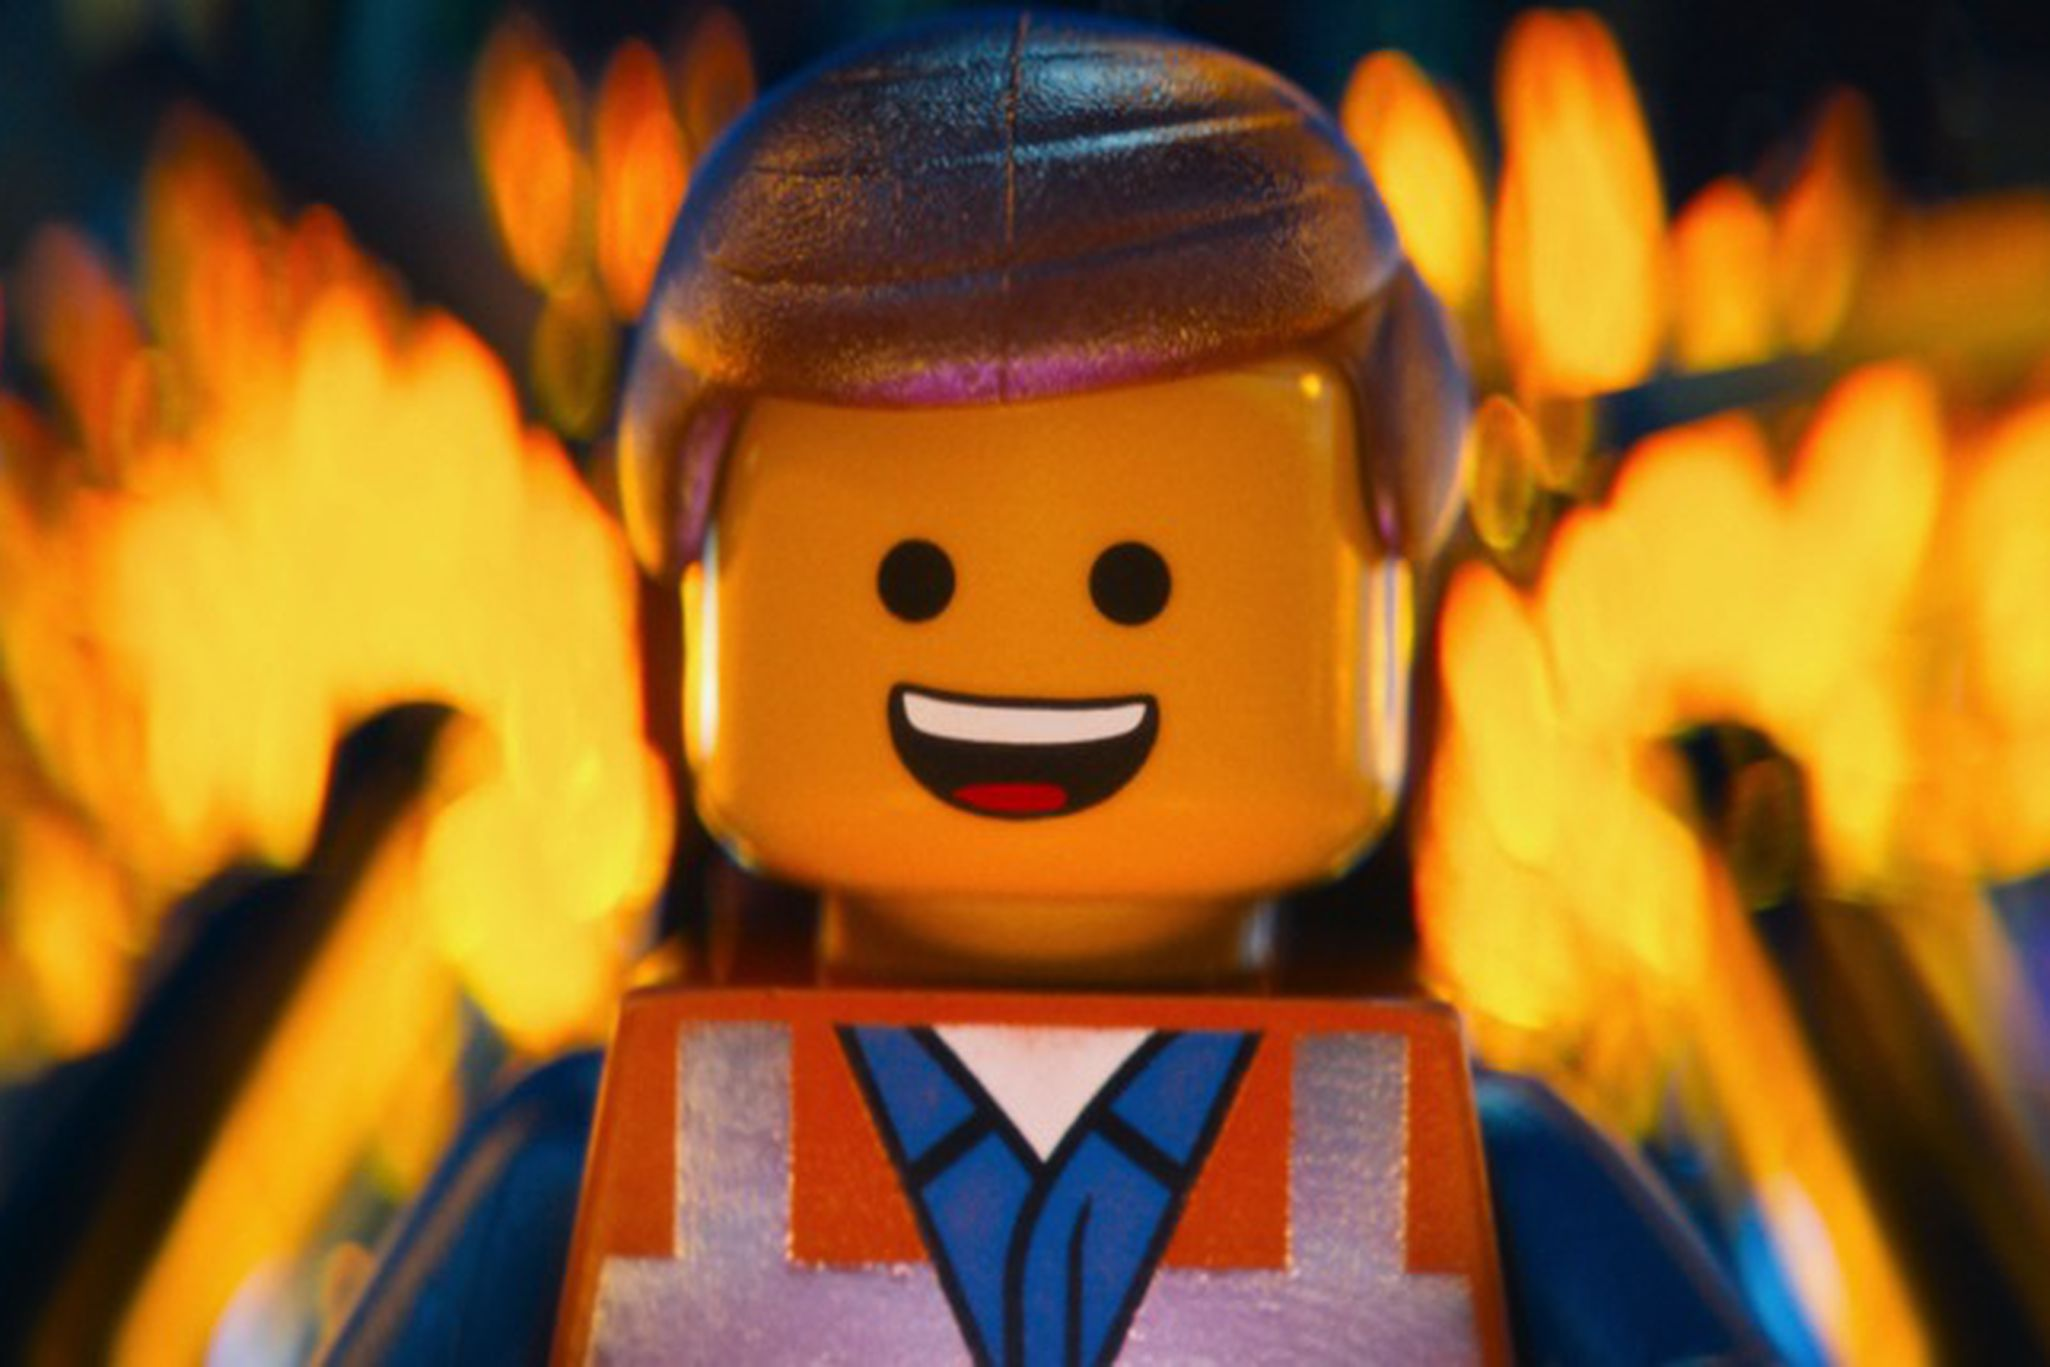 Movies Like Free Guy - The Lego Movie